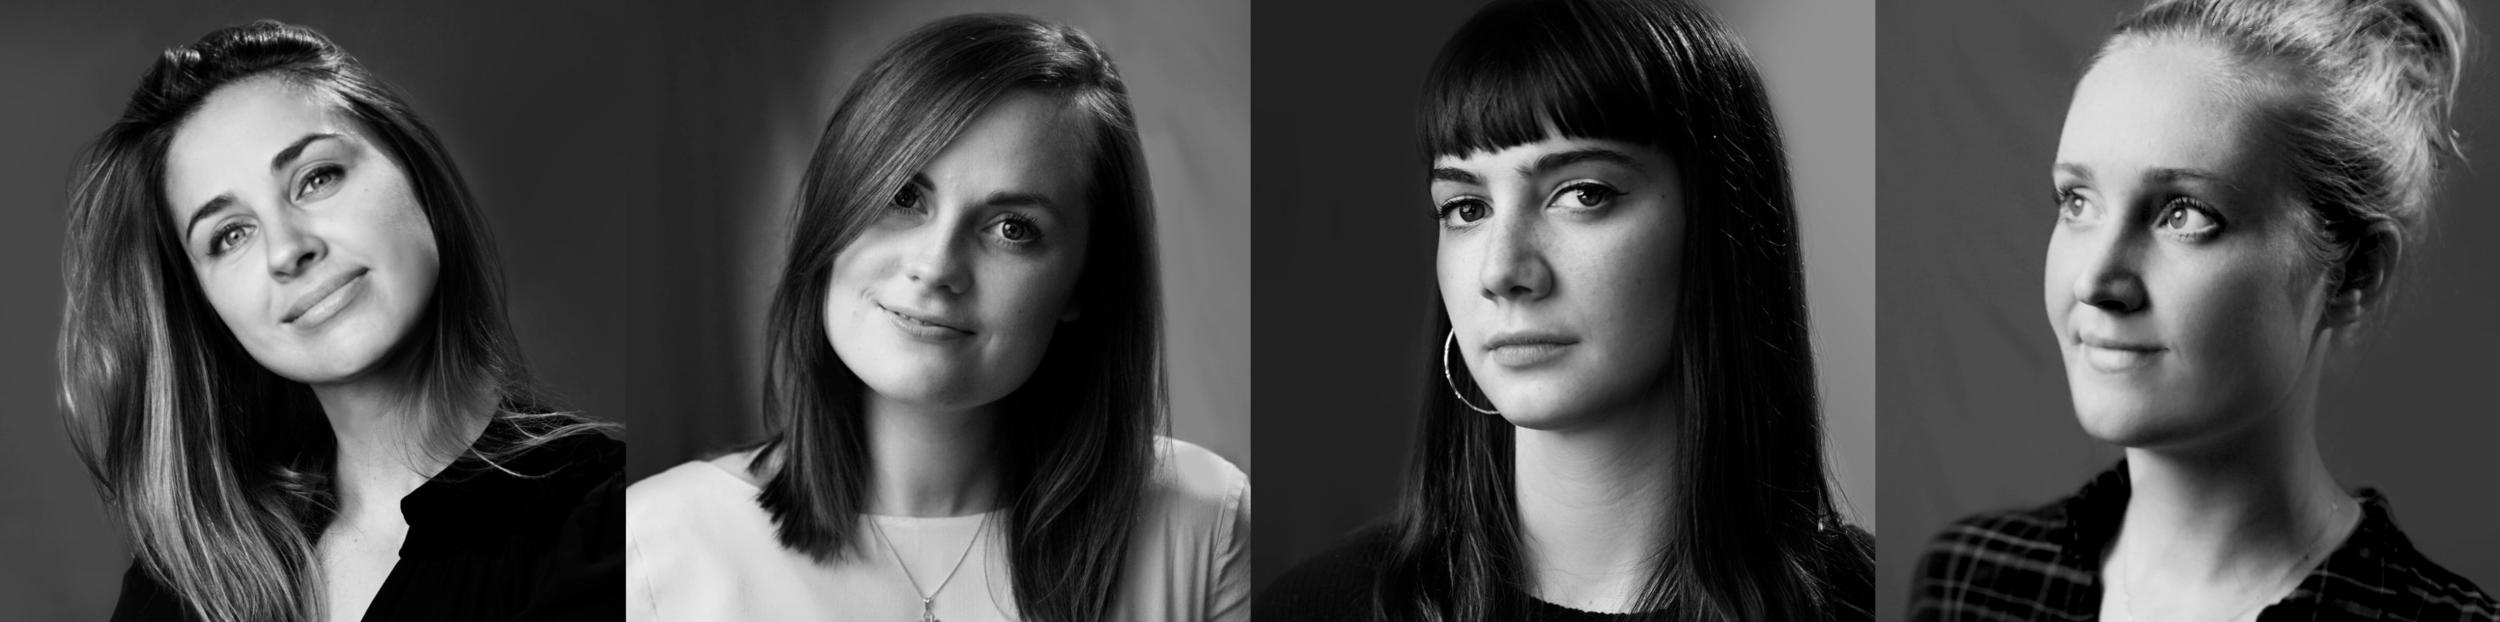 First year students Natalia Chernaya, Christine Gjelstrup, Vanessa Crouch and Katie Graham, creators of the documentary 'Outcasting' (2018)